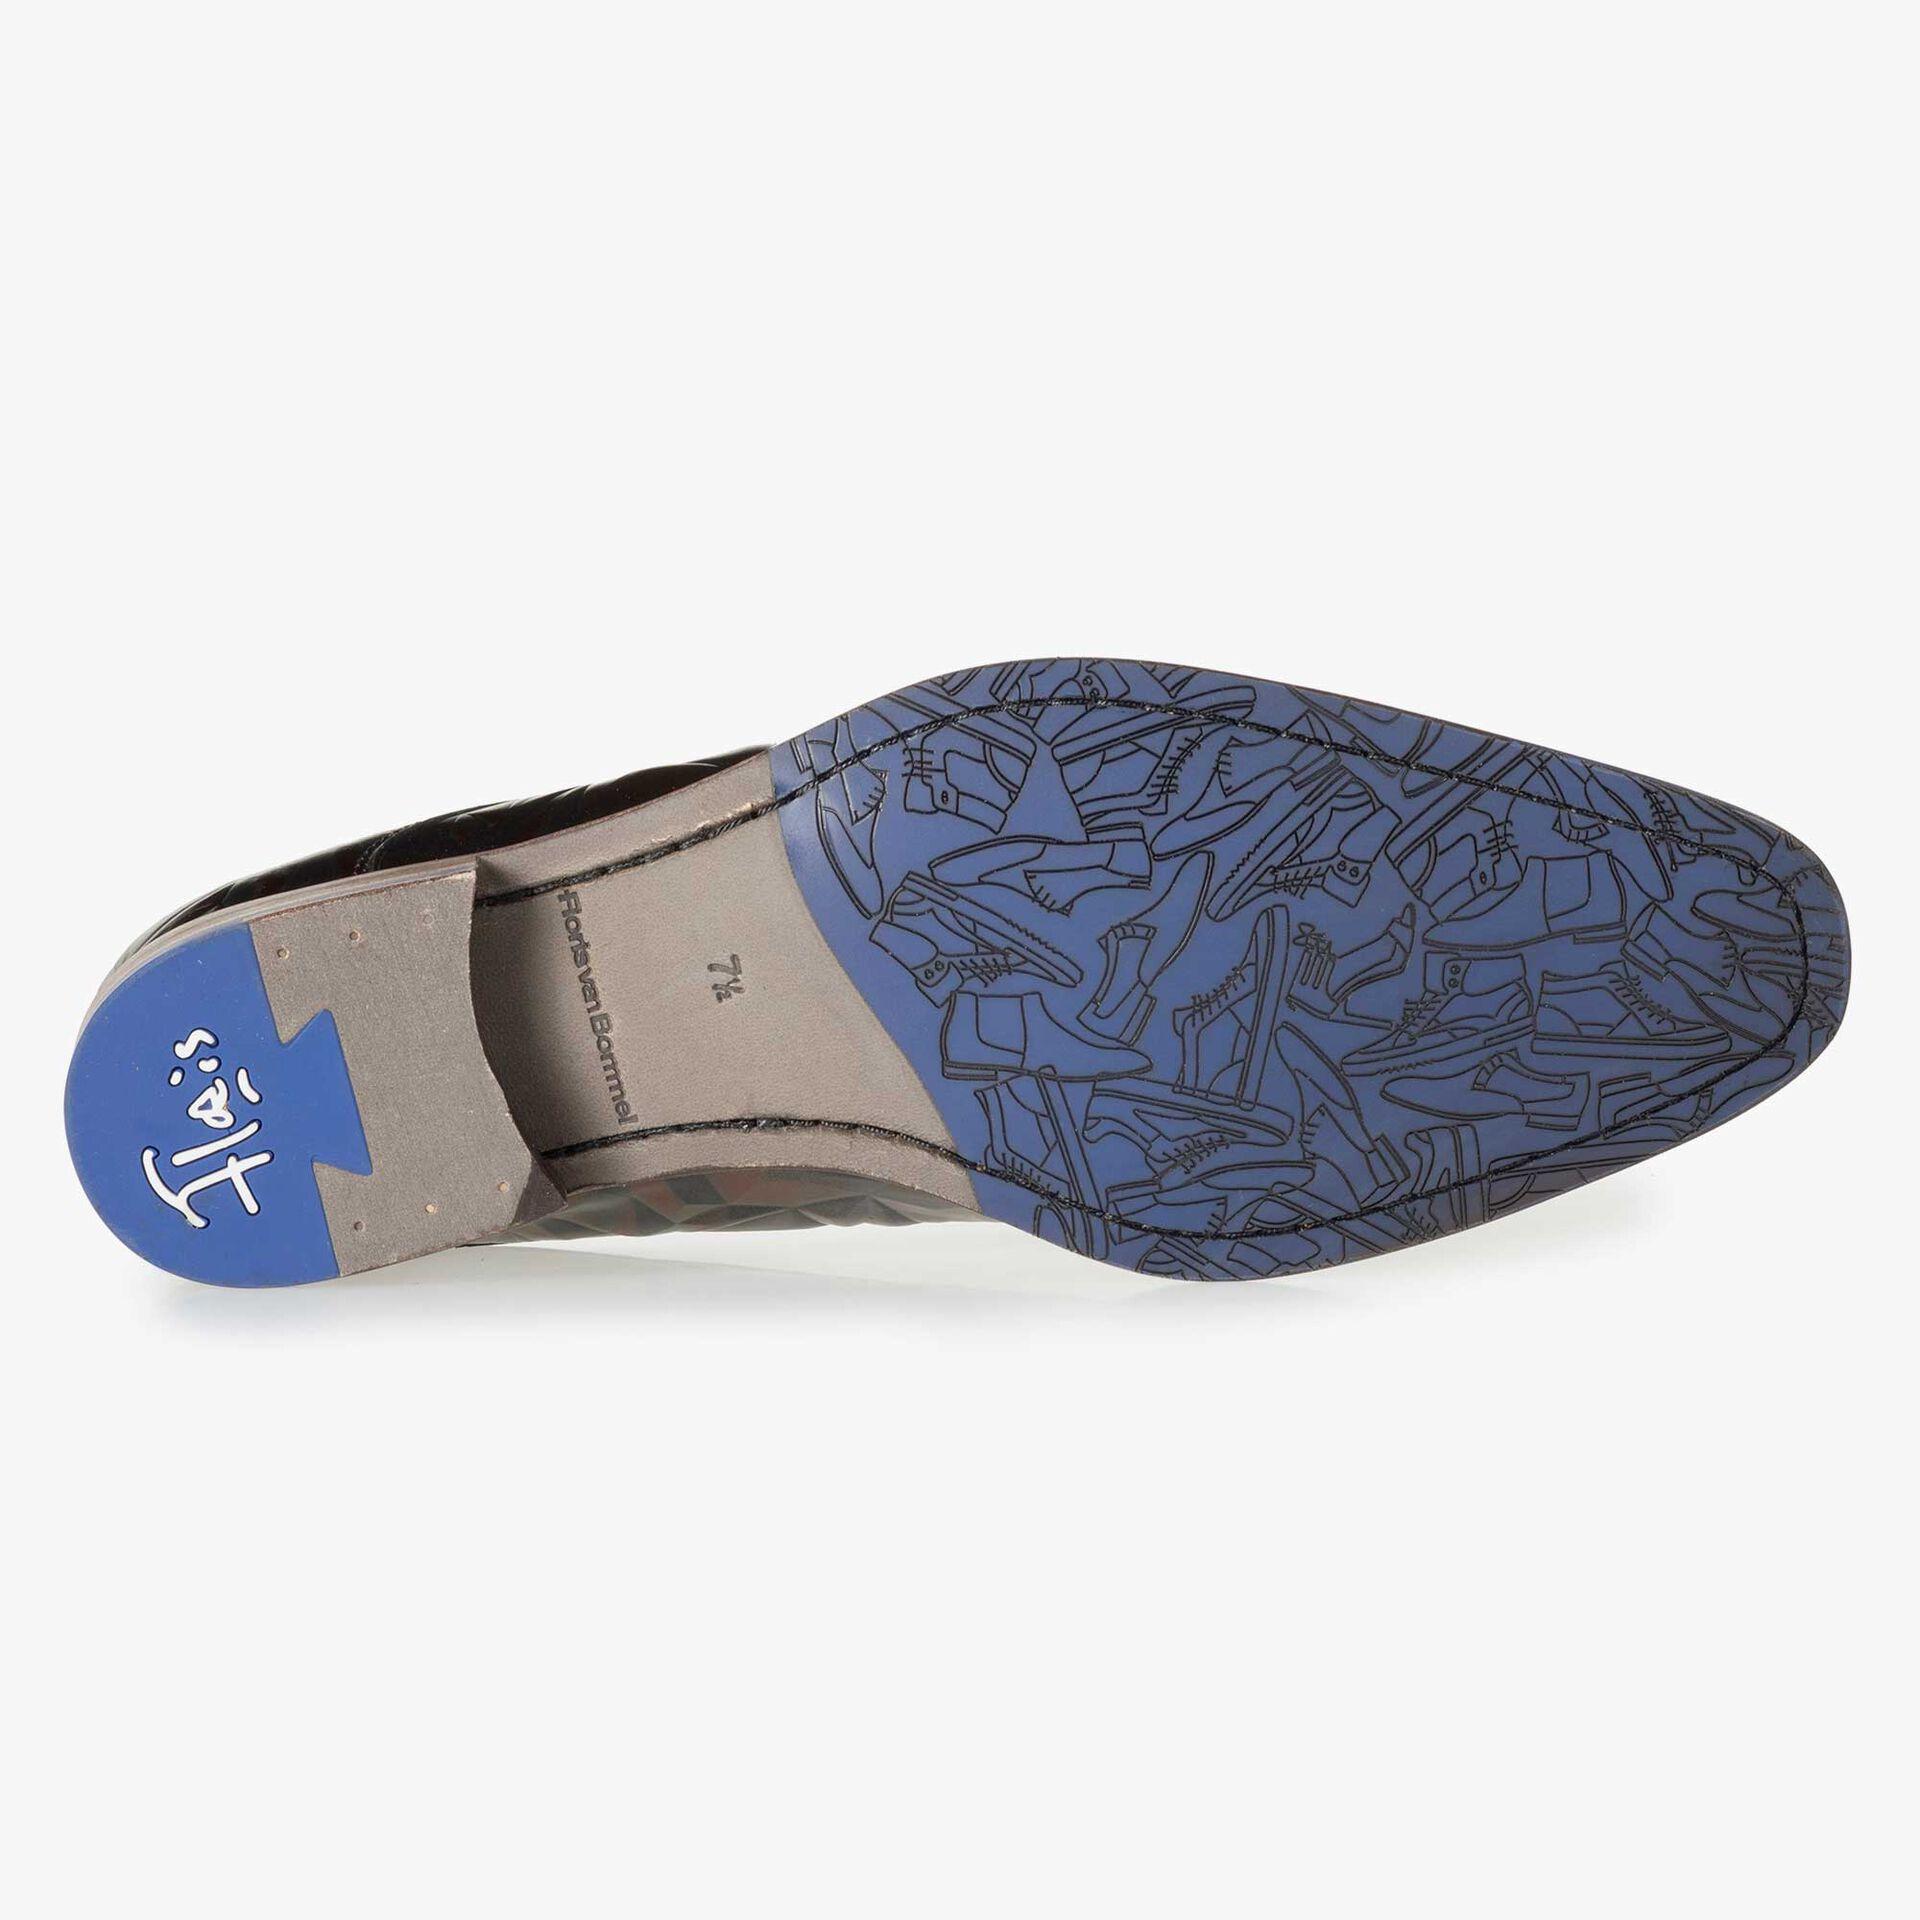 Floris van Bommel men's brown leather lace shoe finished with a copper-coloured 3D effect